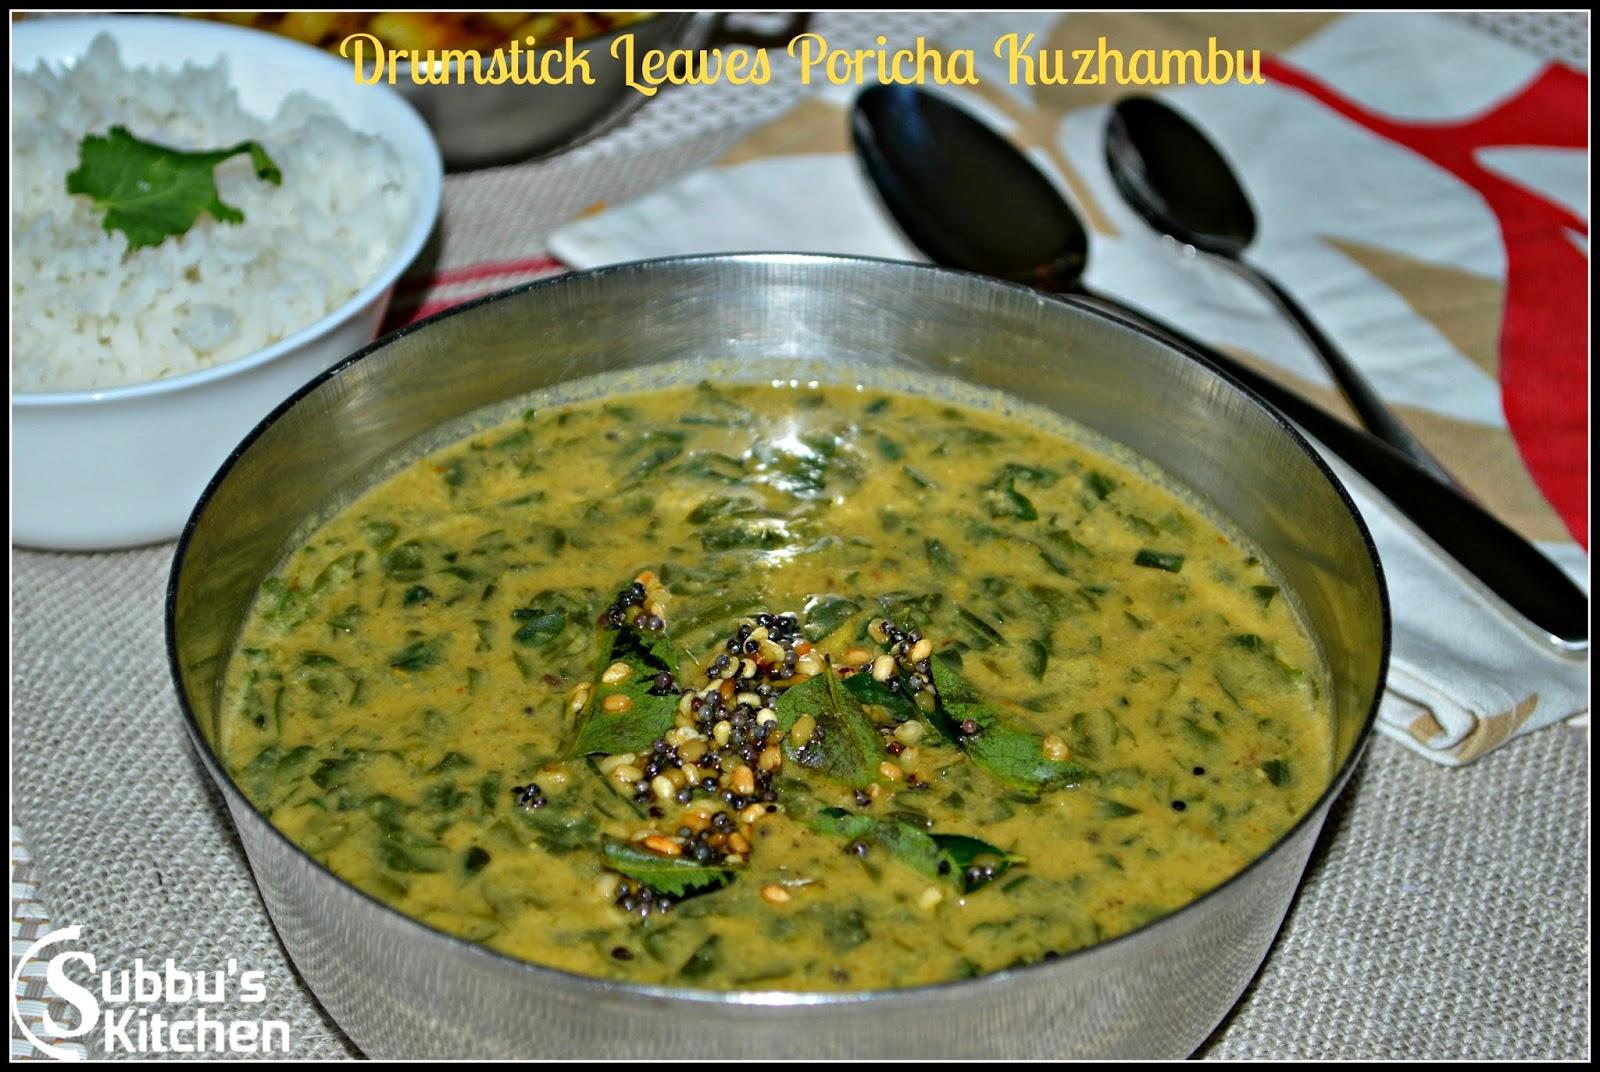 Kuzhambu Recipe Subbus Kitchen